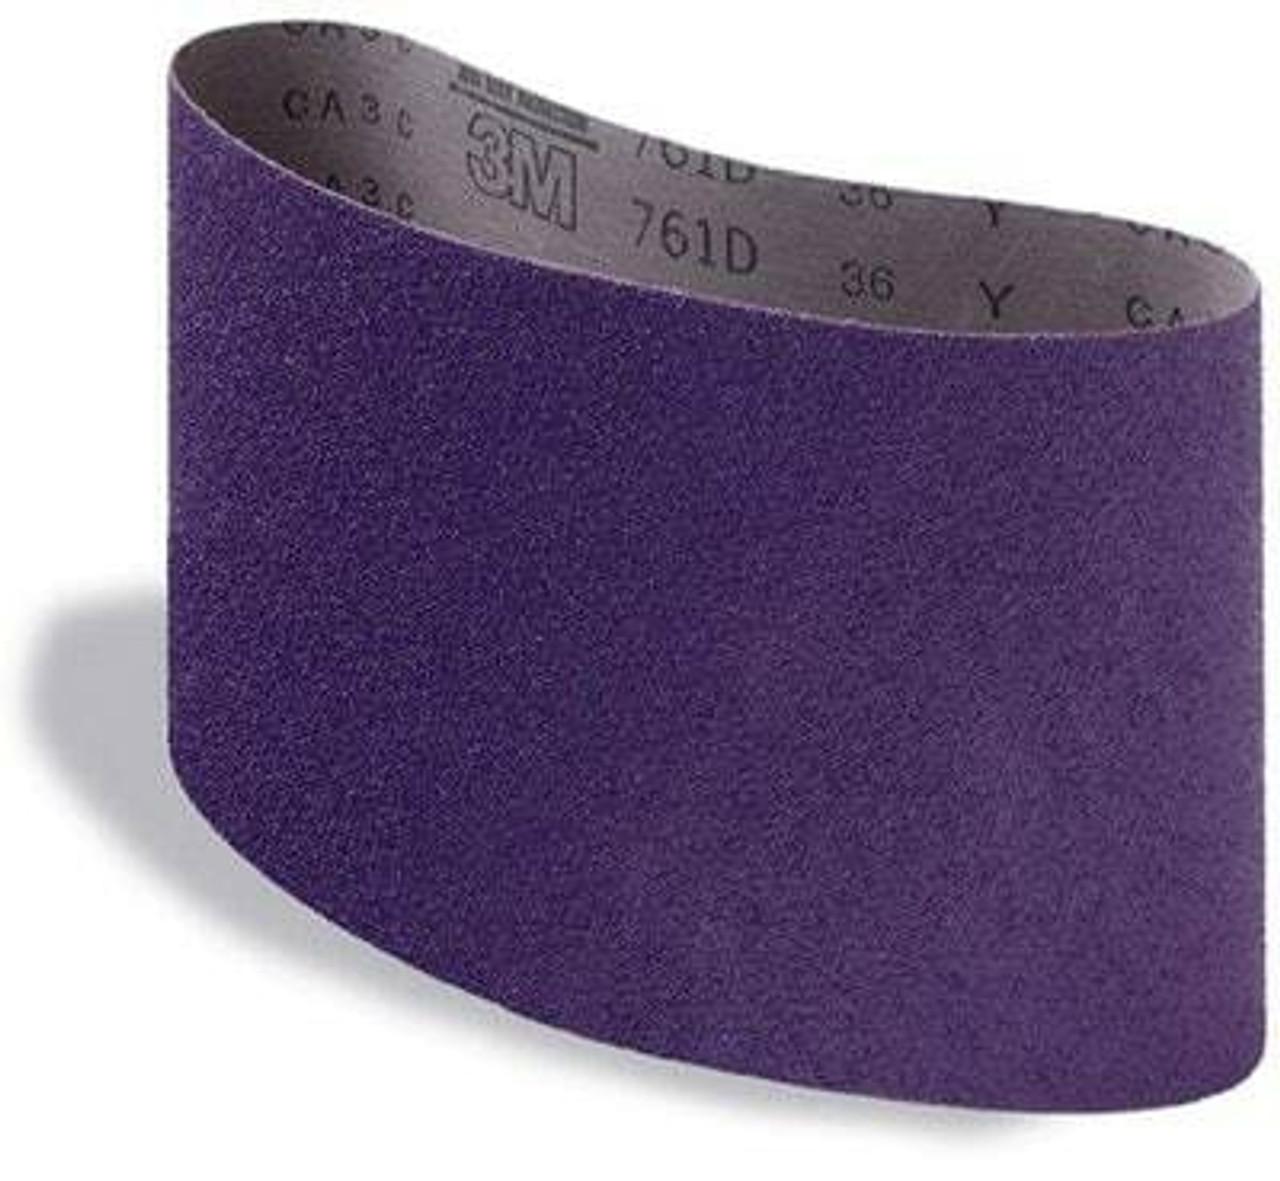 3M™ Regalite™ Resin Bond Cloth Belt 04147, 7.875 in x 29.5 in 80Y Grit